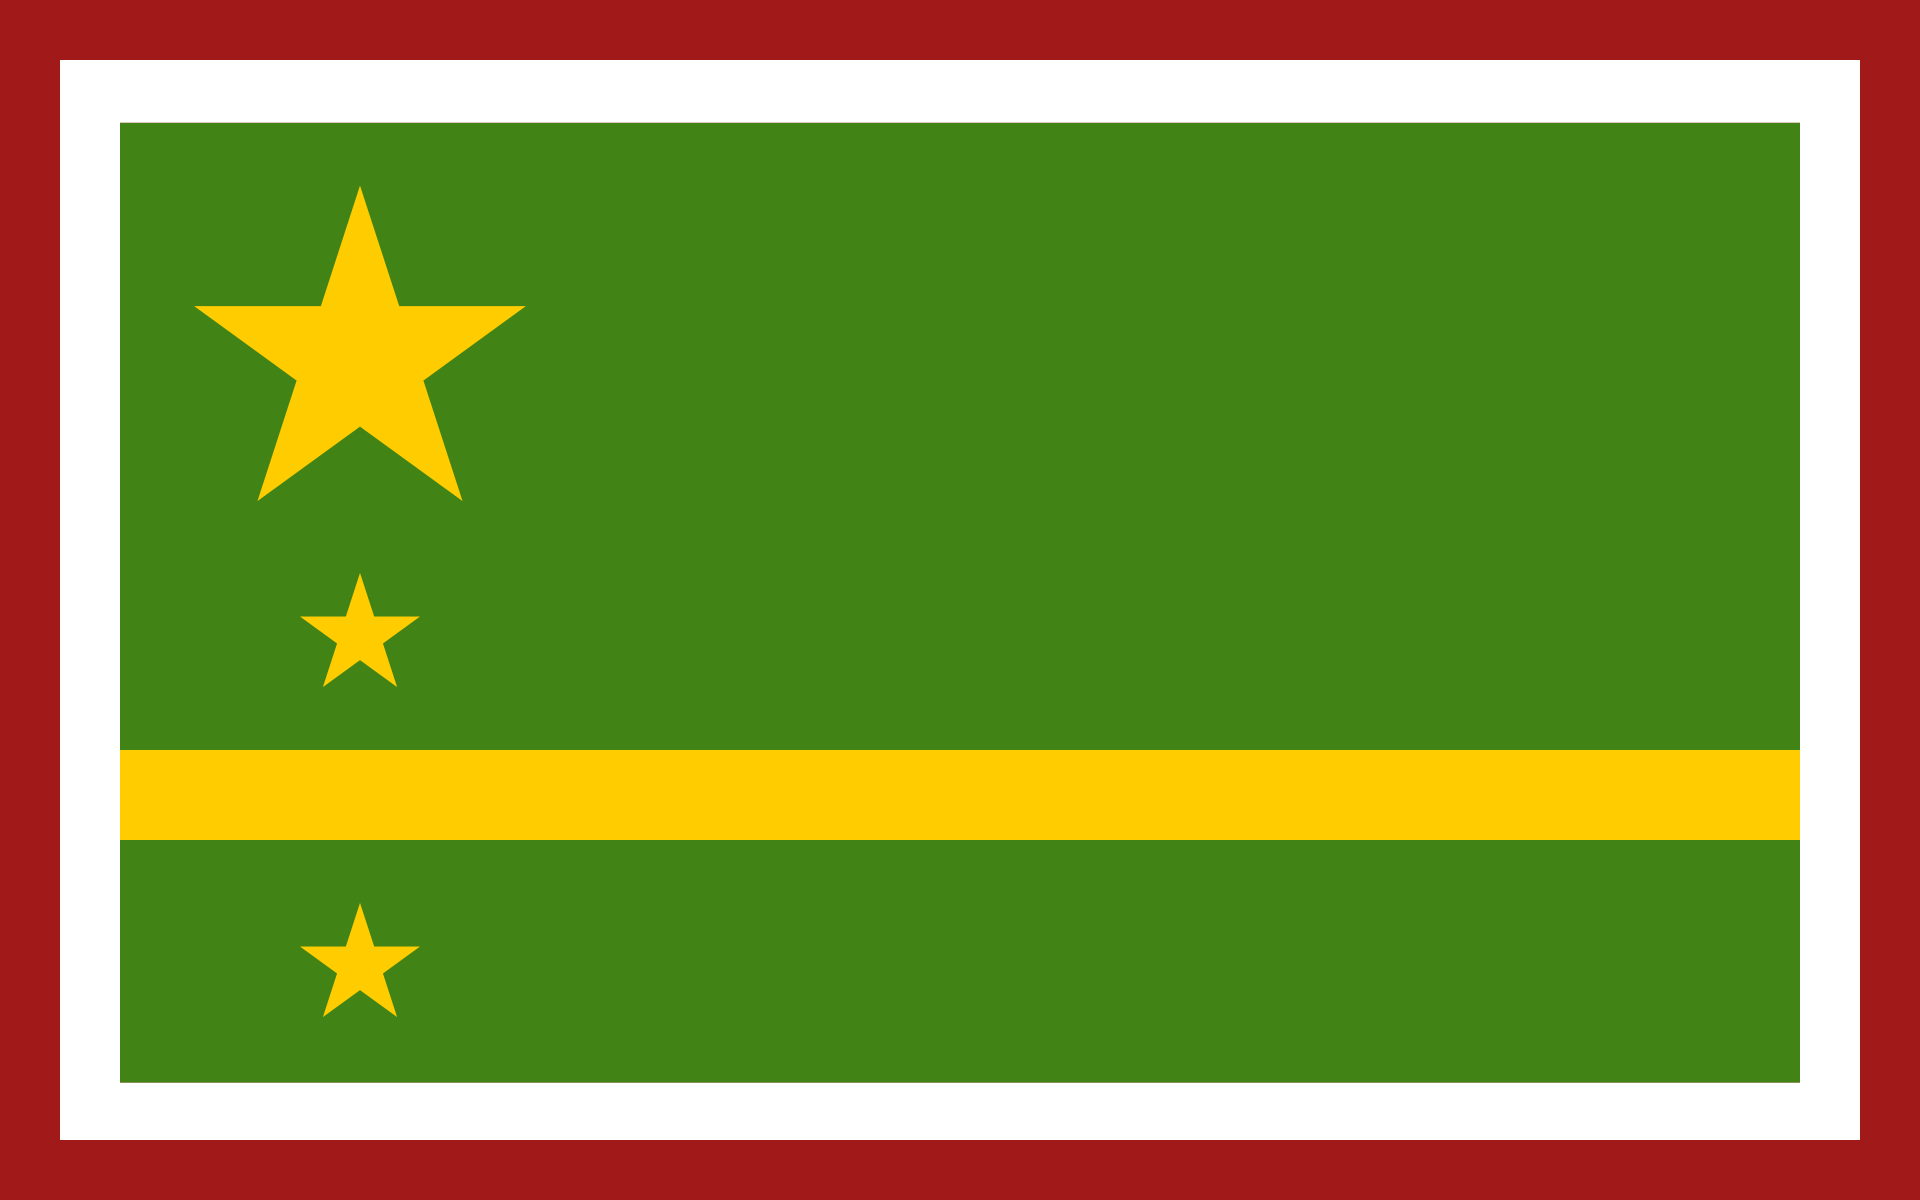 http://fc00.deviantart.net/fs71/f/2014/059/c/8/flags_of_touhou__hong_meiling_by_greatpaperwolf-d6kjlxd.png